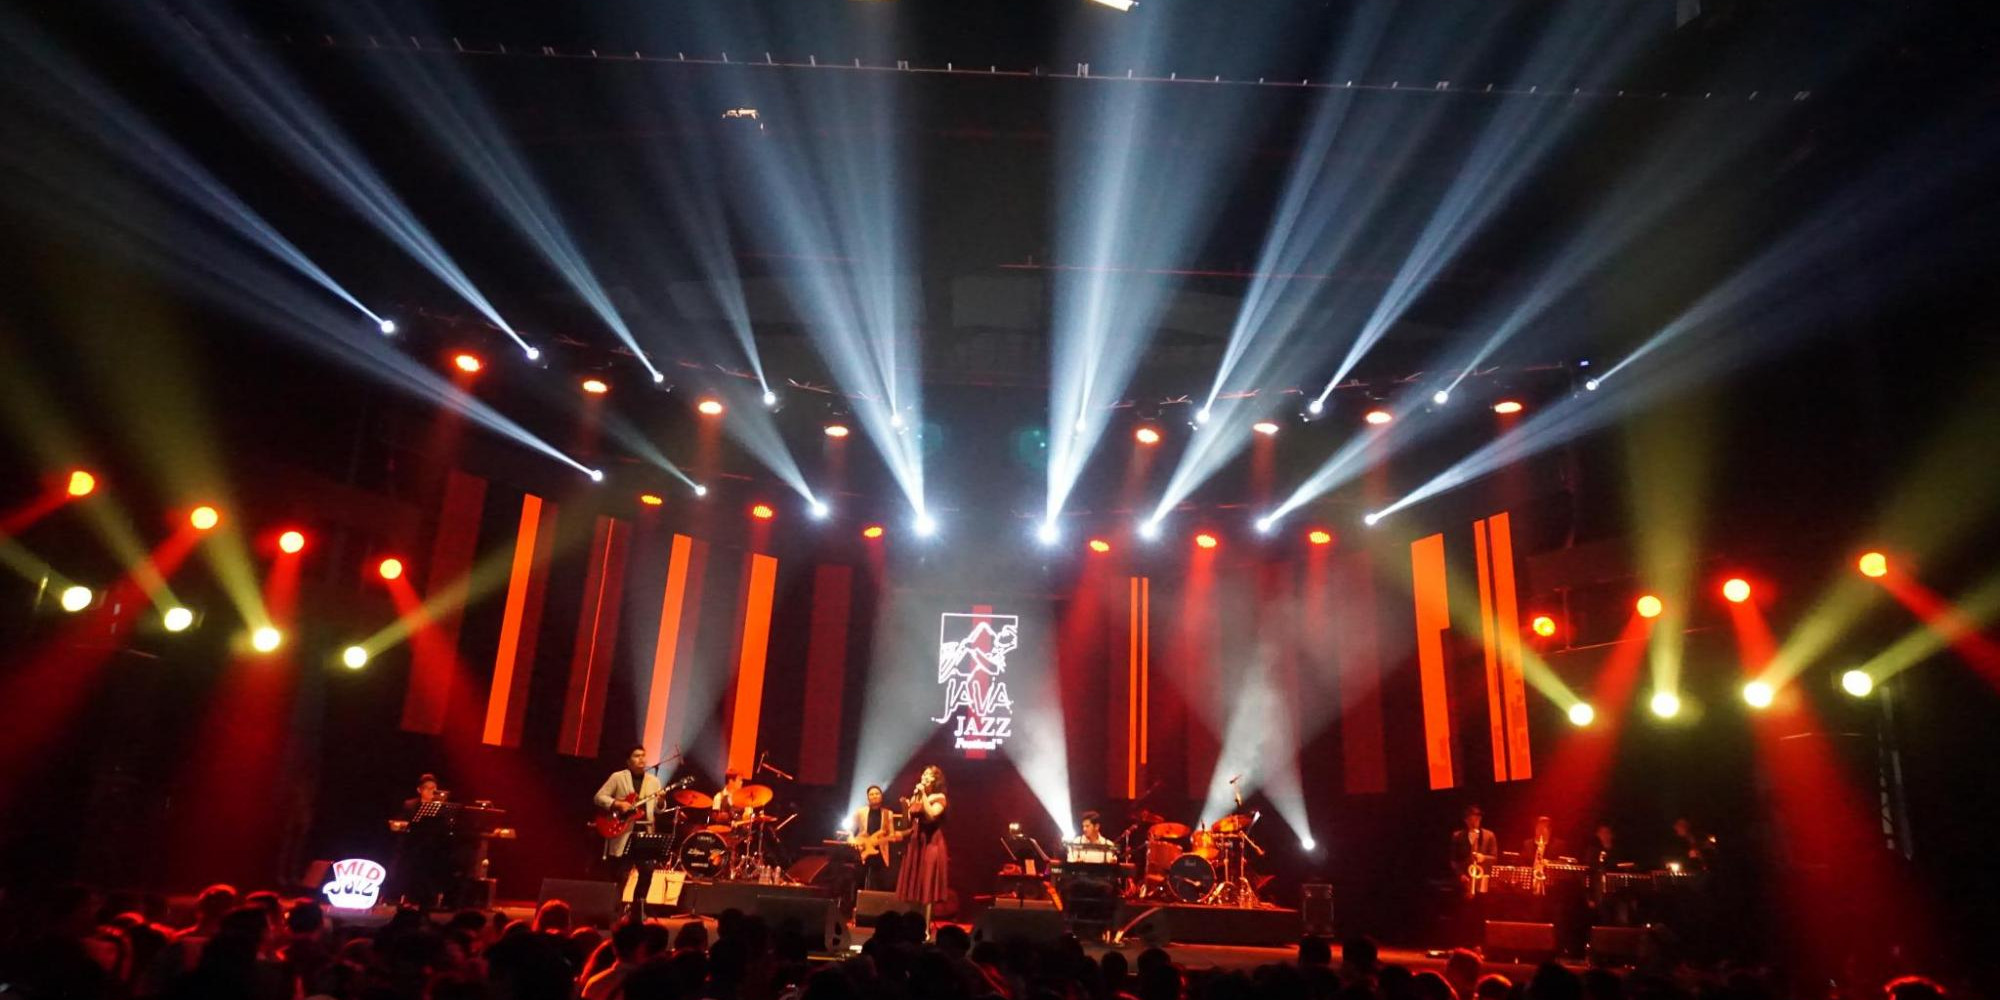 Addie MS, Afgan, dan H.E.R pukau penonton BNI Java Jazz Festival